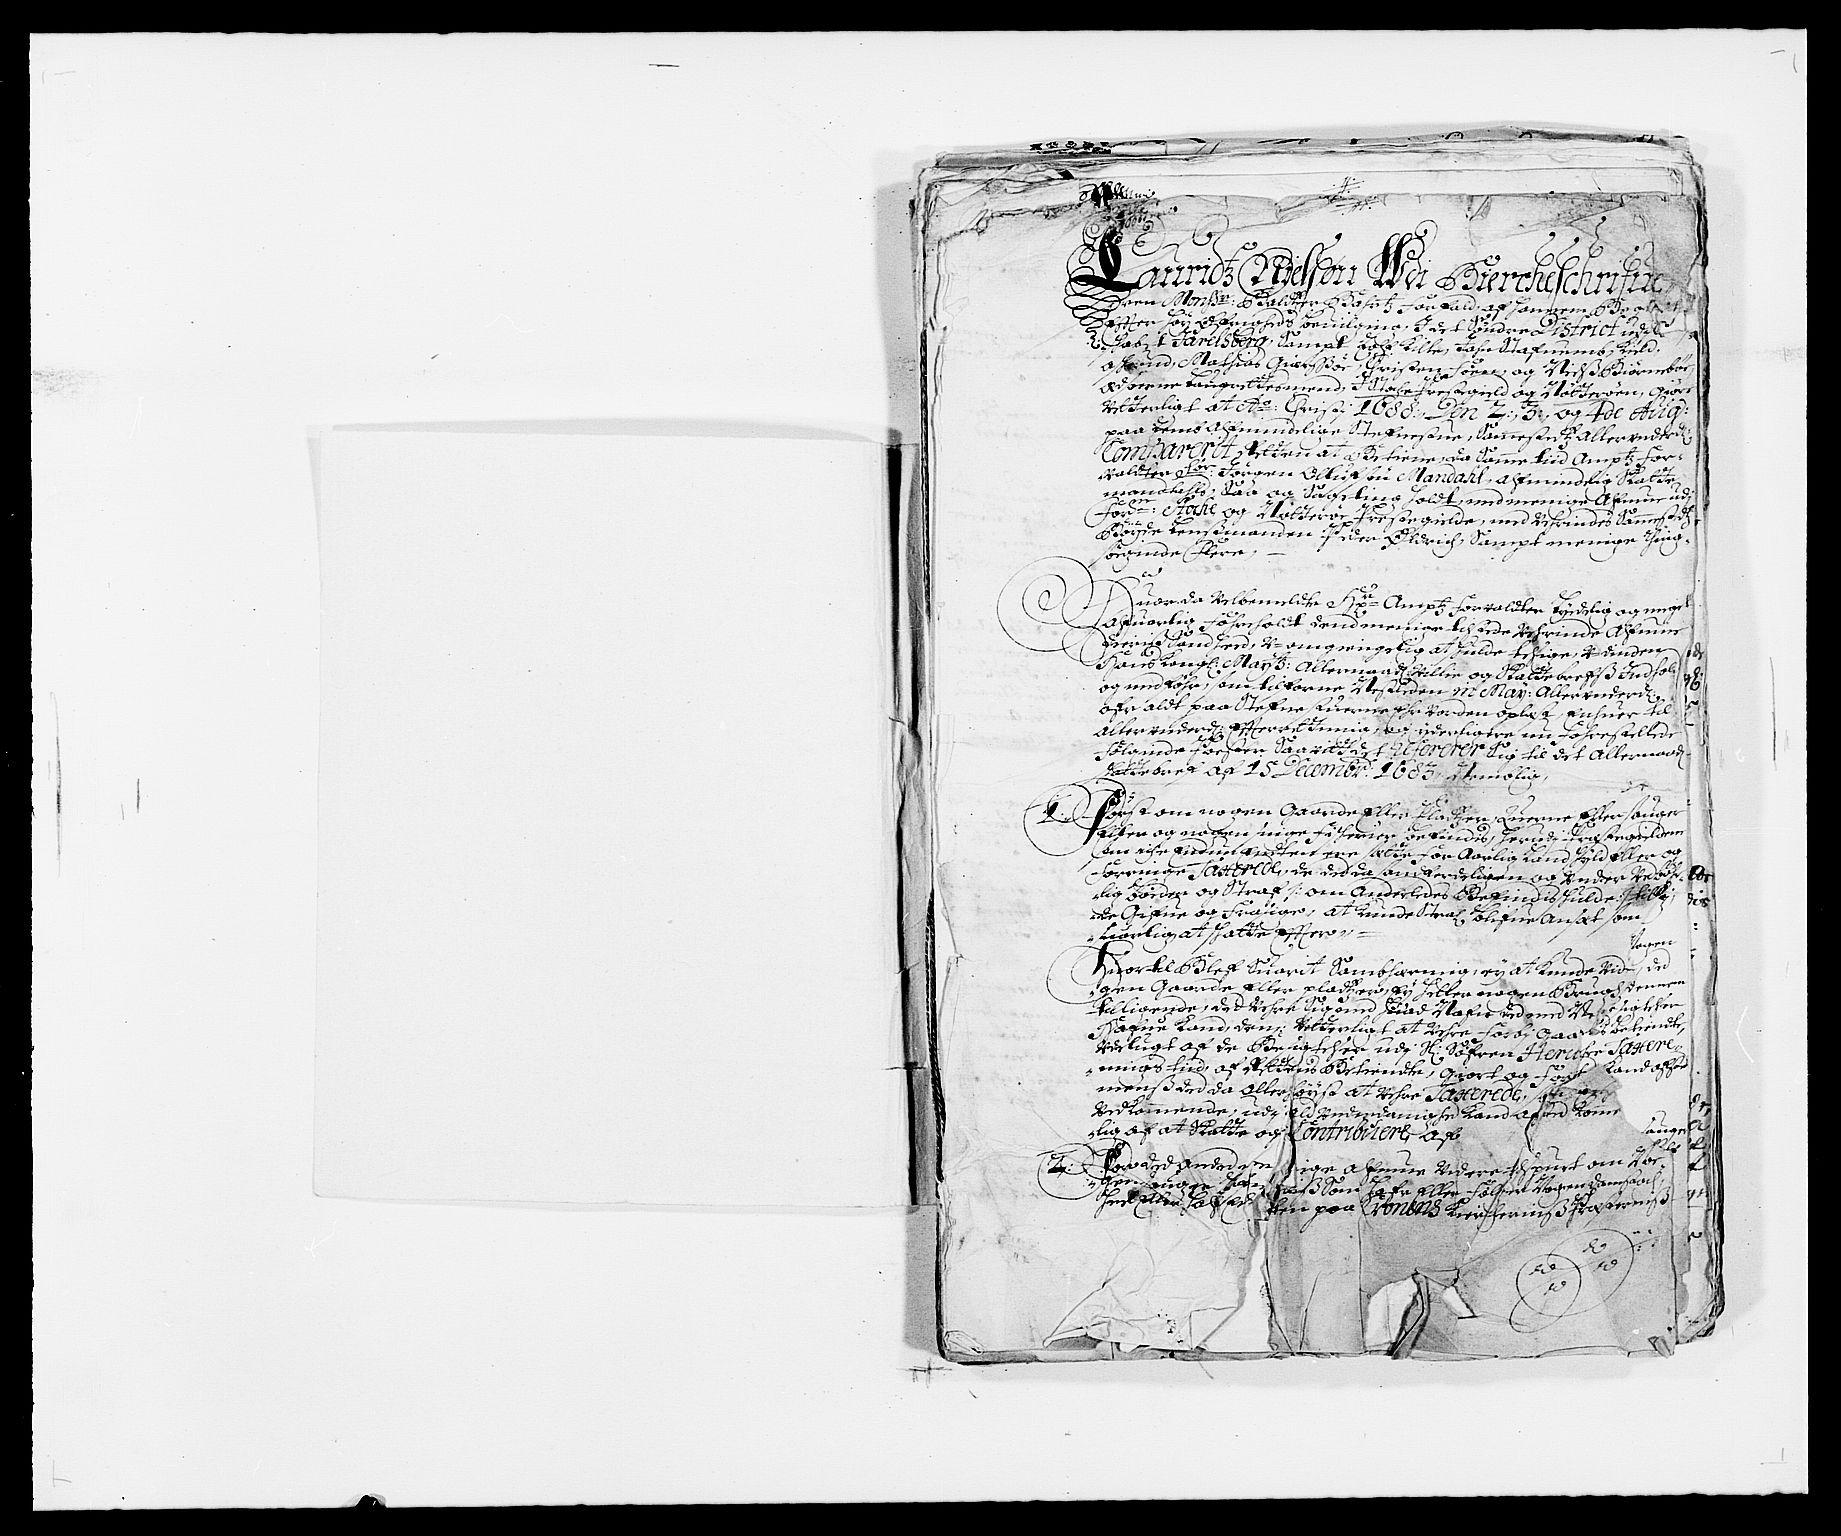 RA, Rentekammeret inntil 1814, Reviderte regnskaper, Fogderegnskap, R32/L1859: Fogderegnskap Jarlsberg grevskap, 1686-1690, s. 344